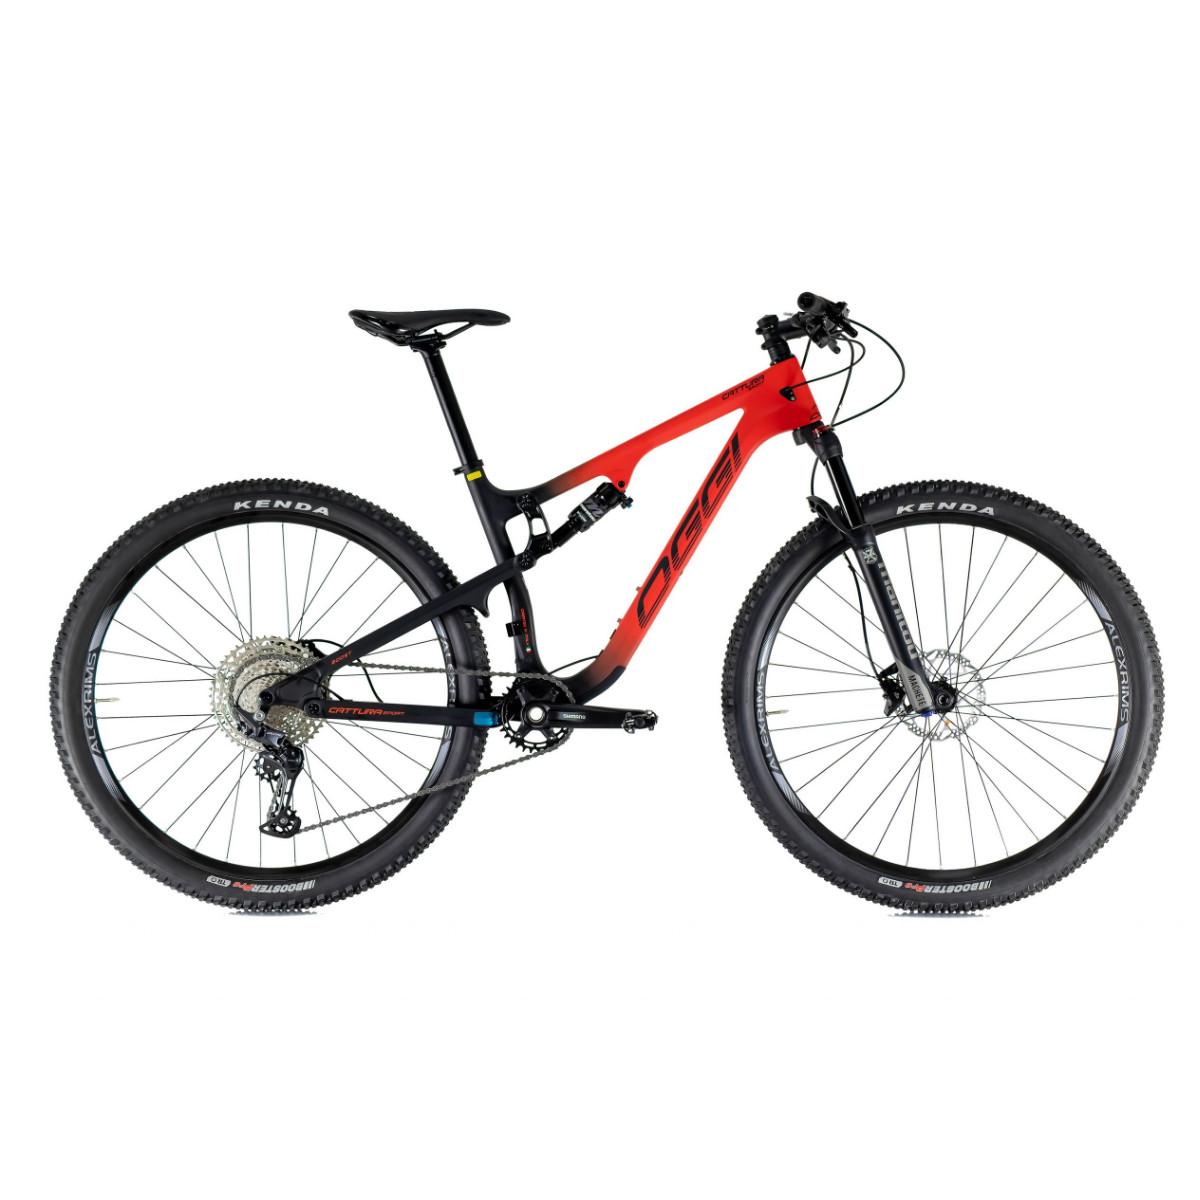 Bicicleta Oggi Cattura Sport Full Suspension Carbon Deore 2021 - Vermelho e Preto